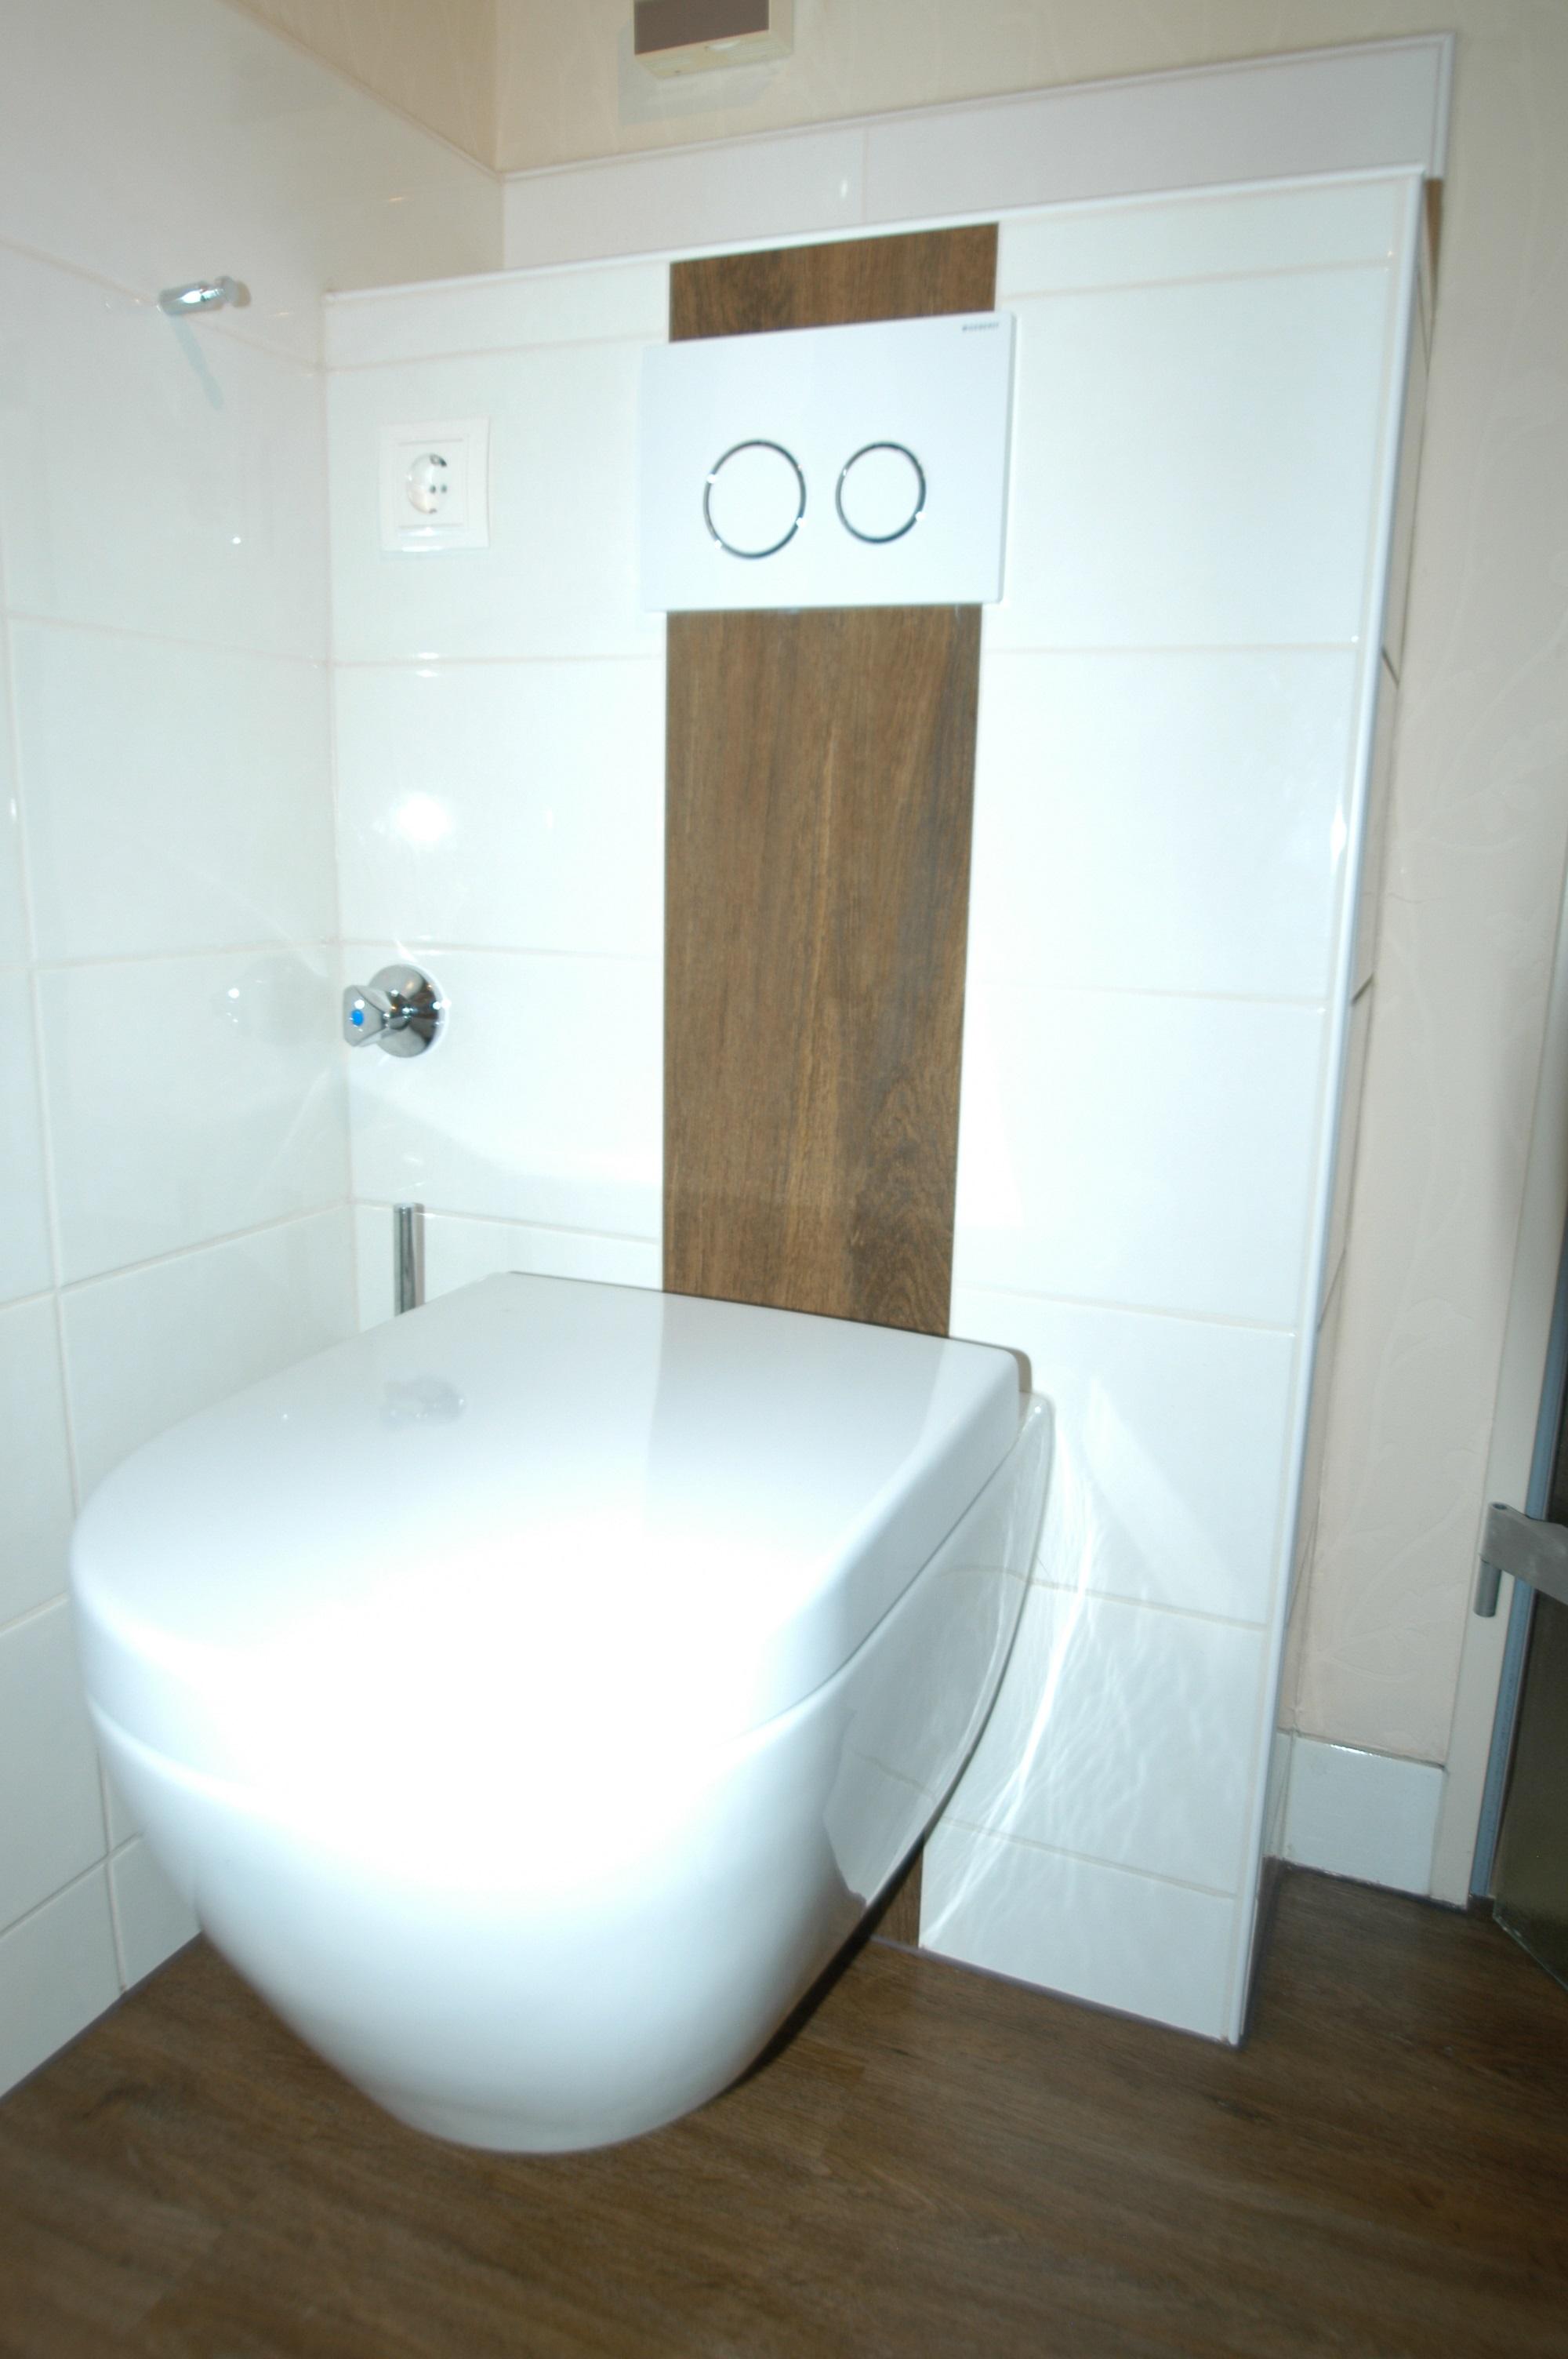 spülrandloses Wand-WC